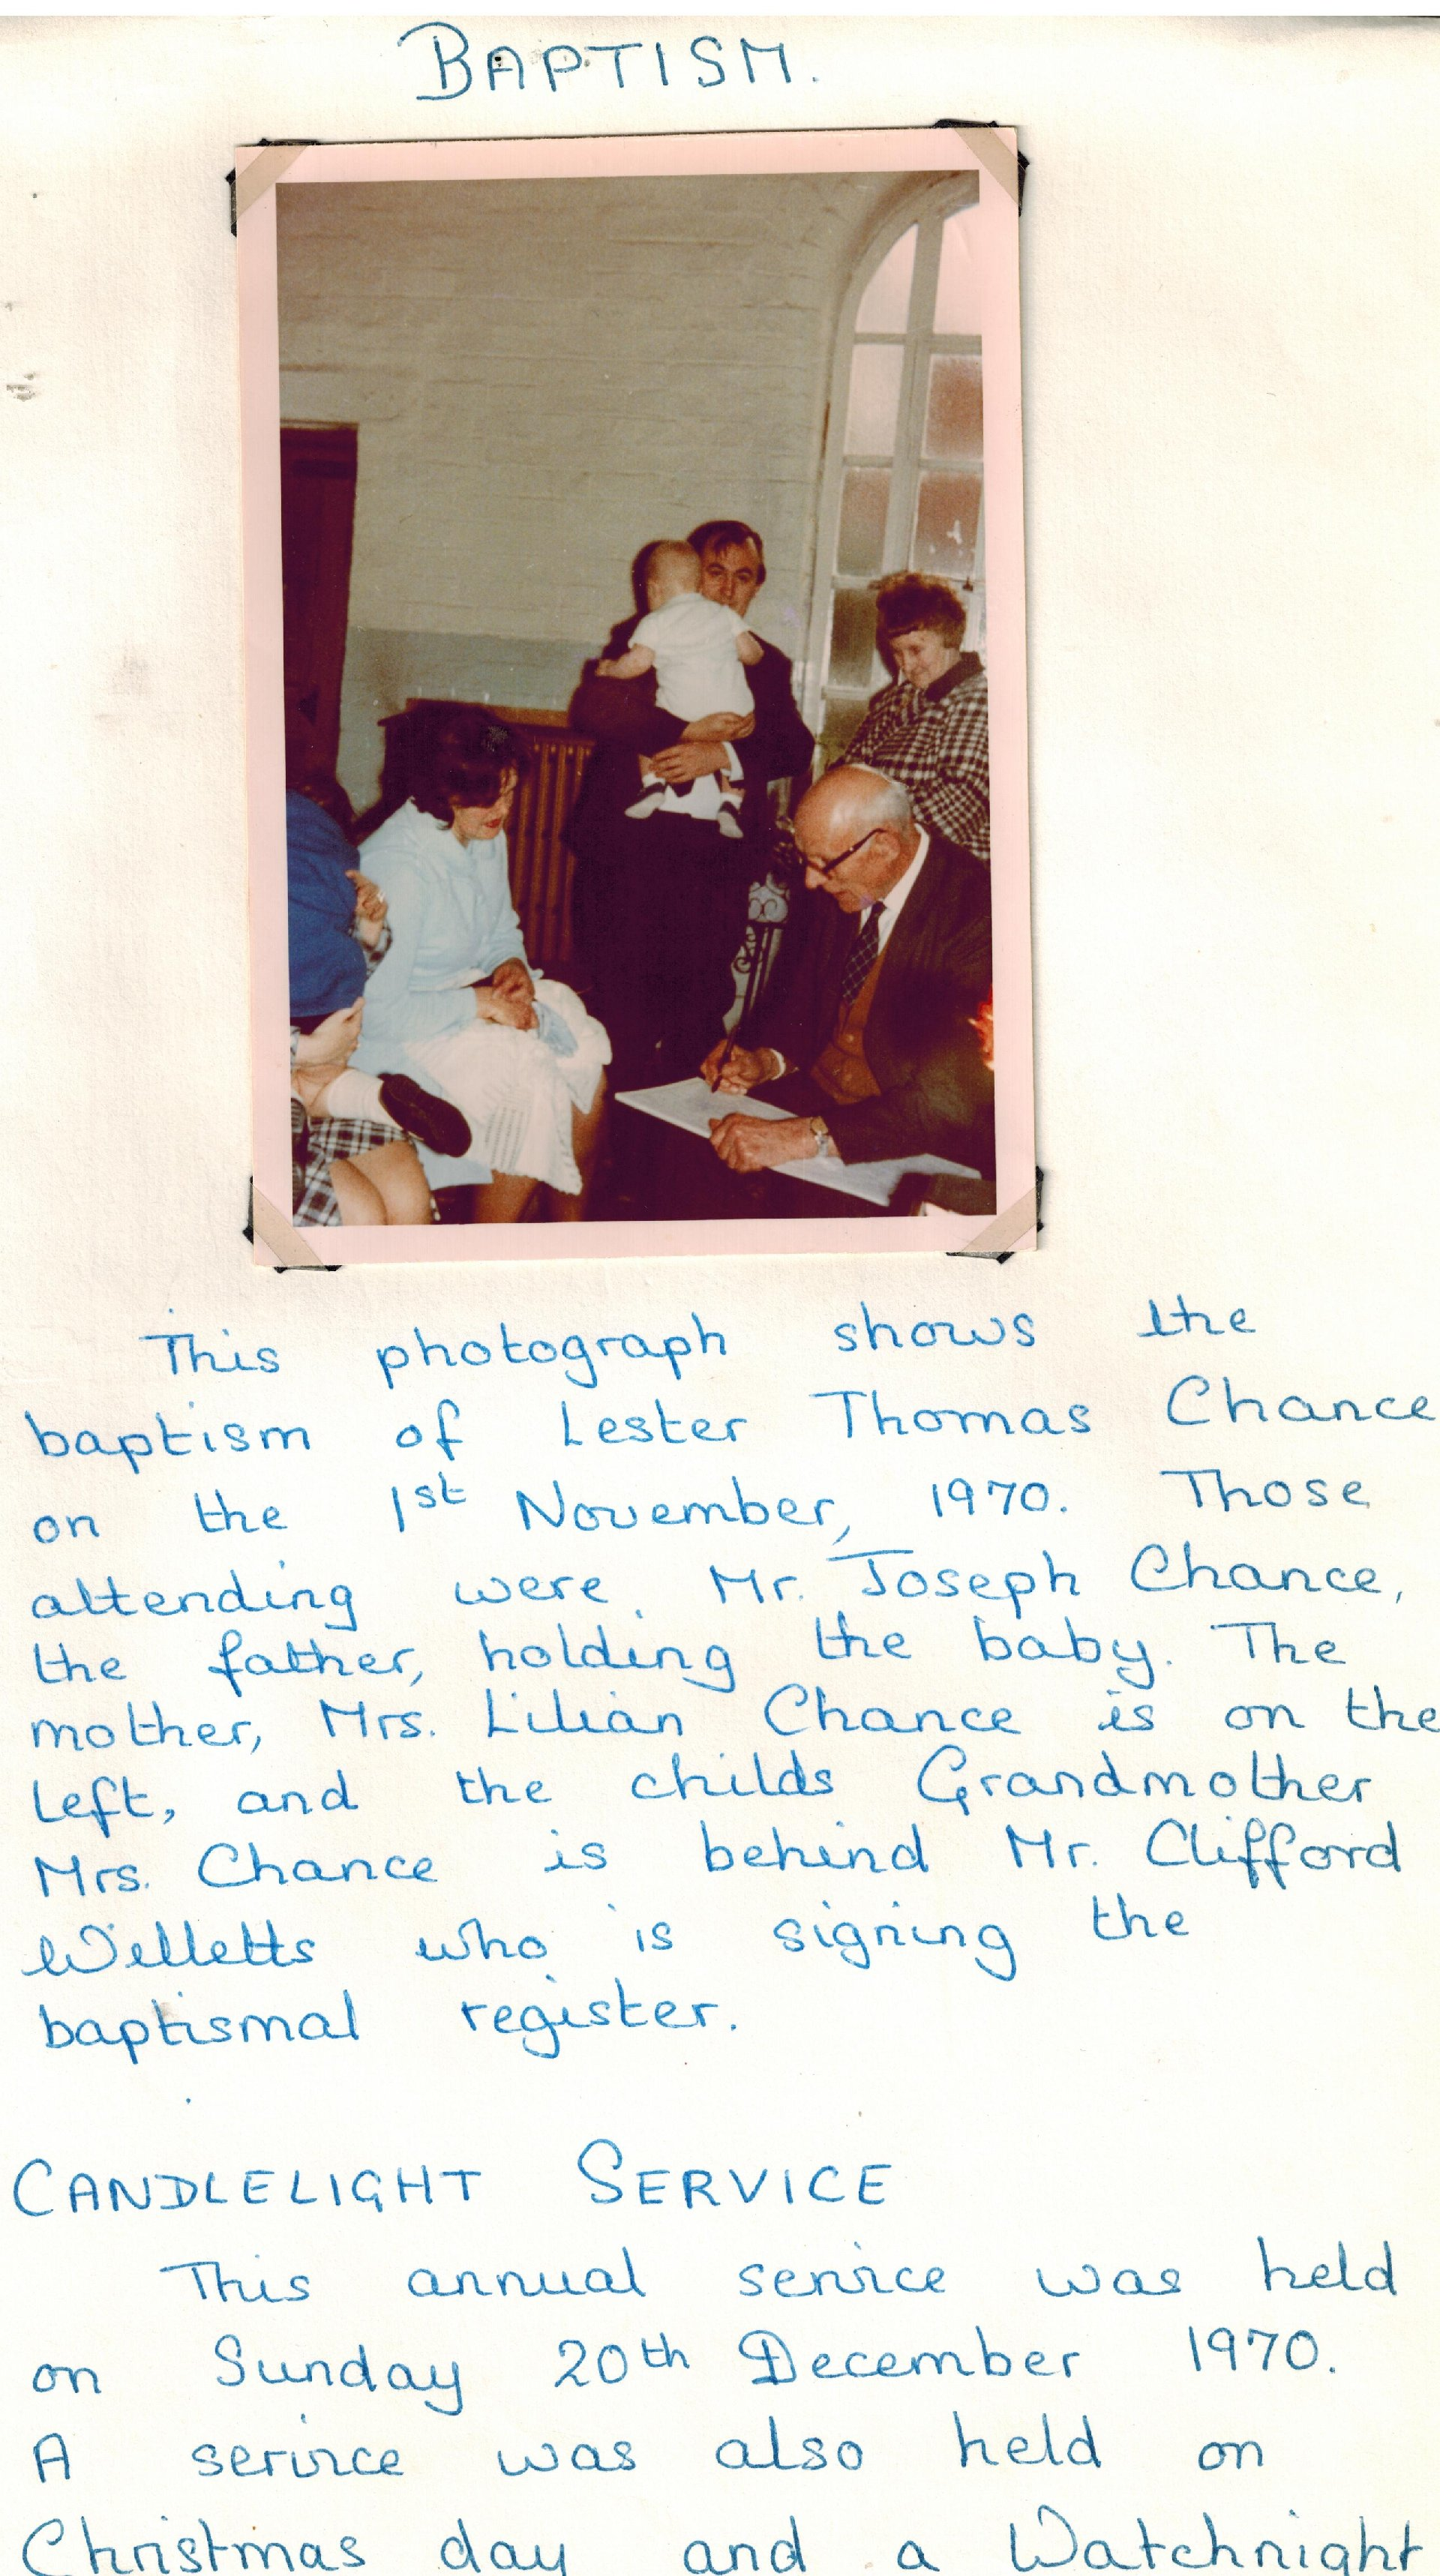 O044_Baptism_[Lester-Thomas_Chance]-1970_11-01